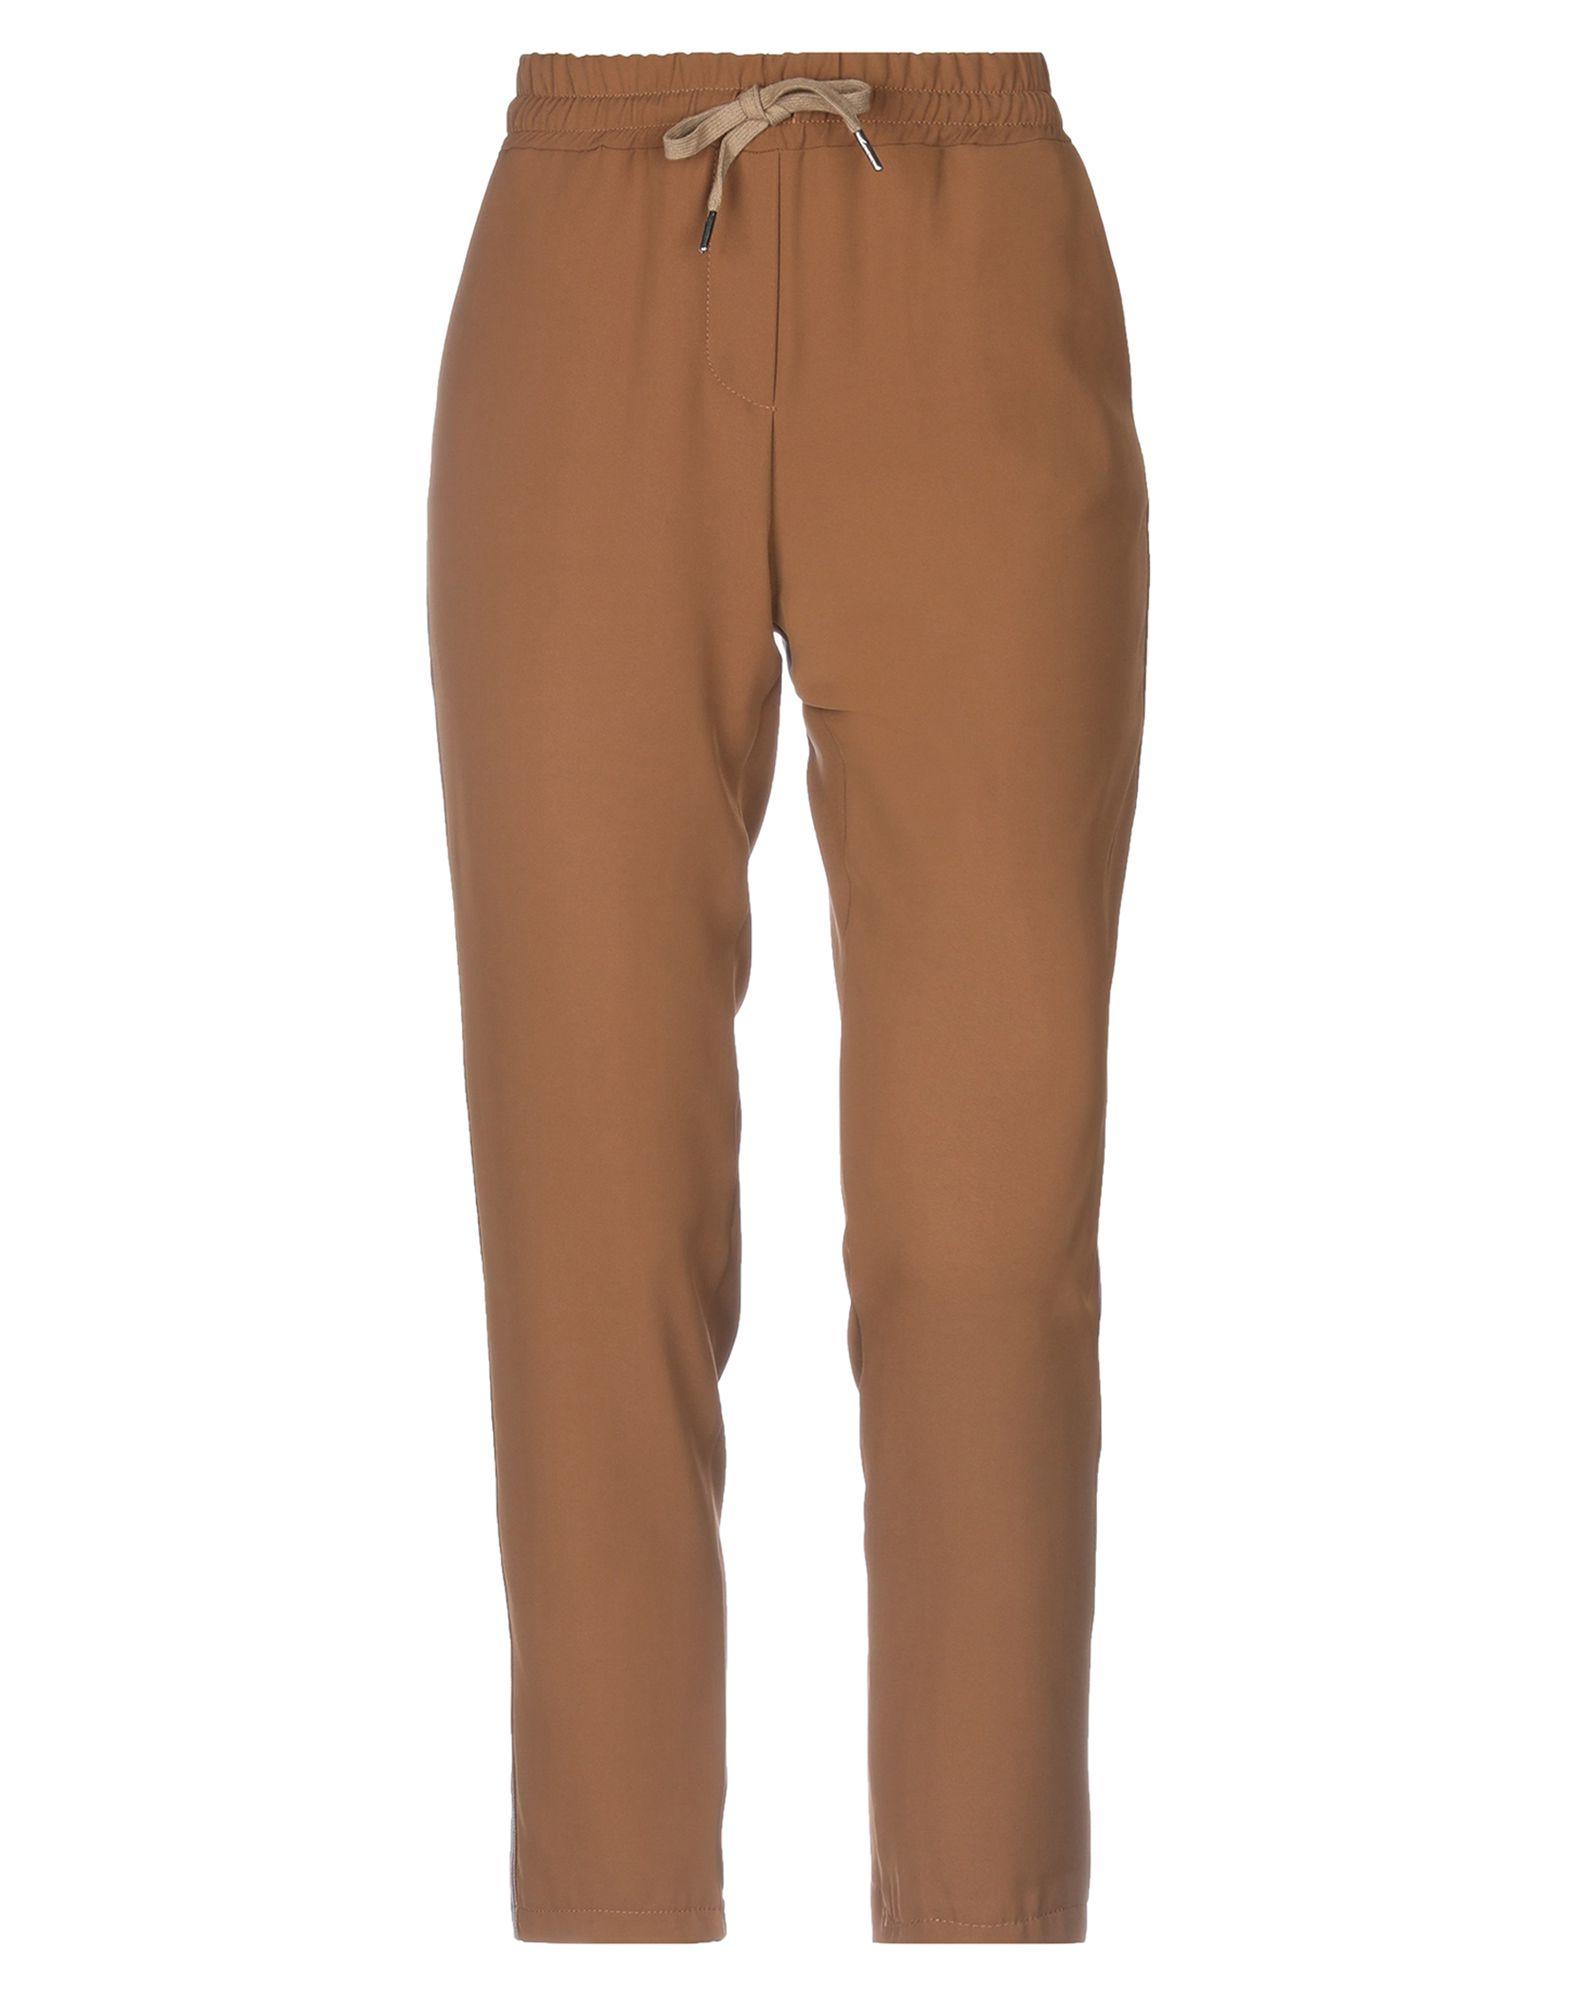 Фото - POUR MOI Повседневные брюки pour moi брюки капри